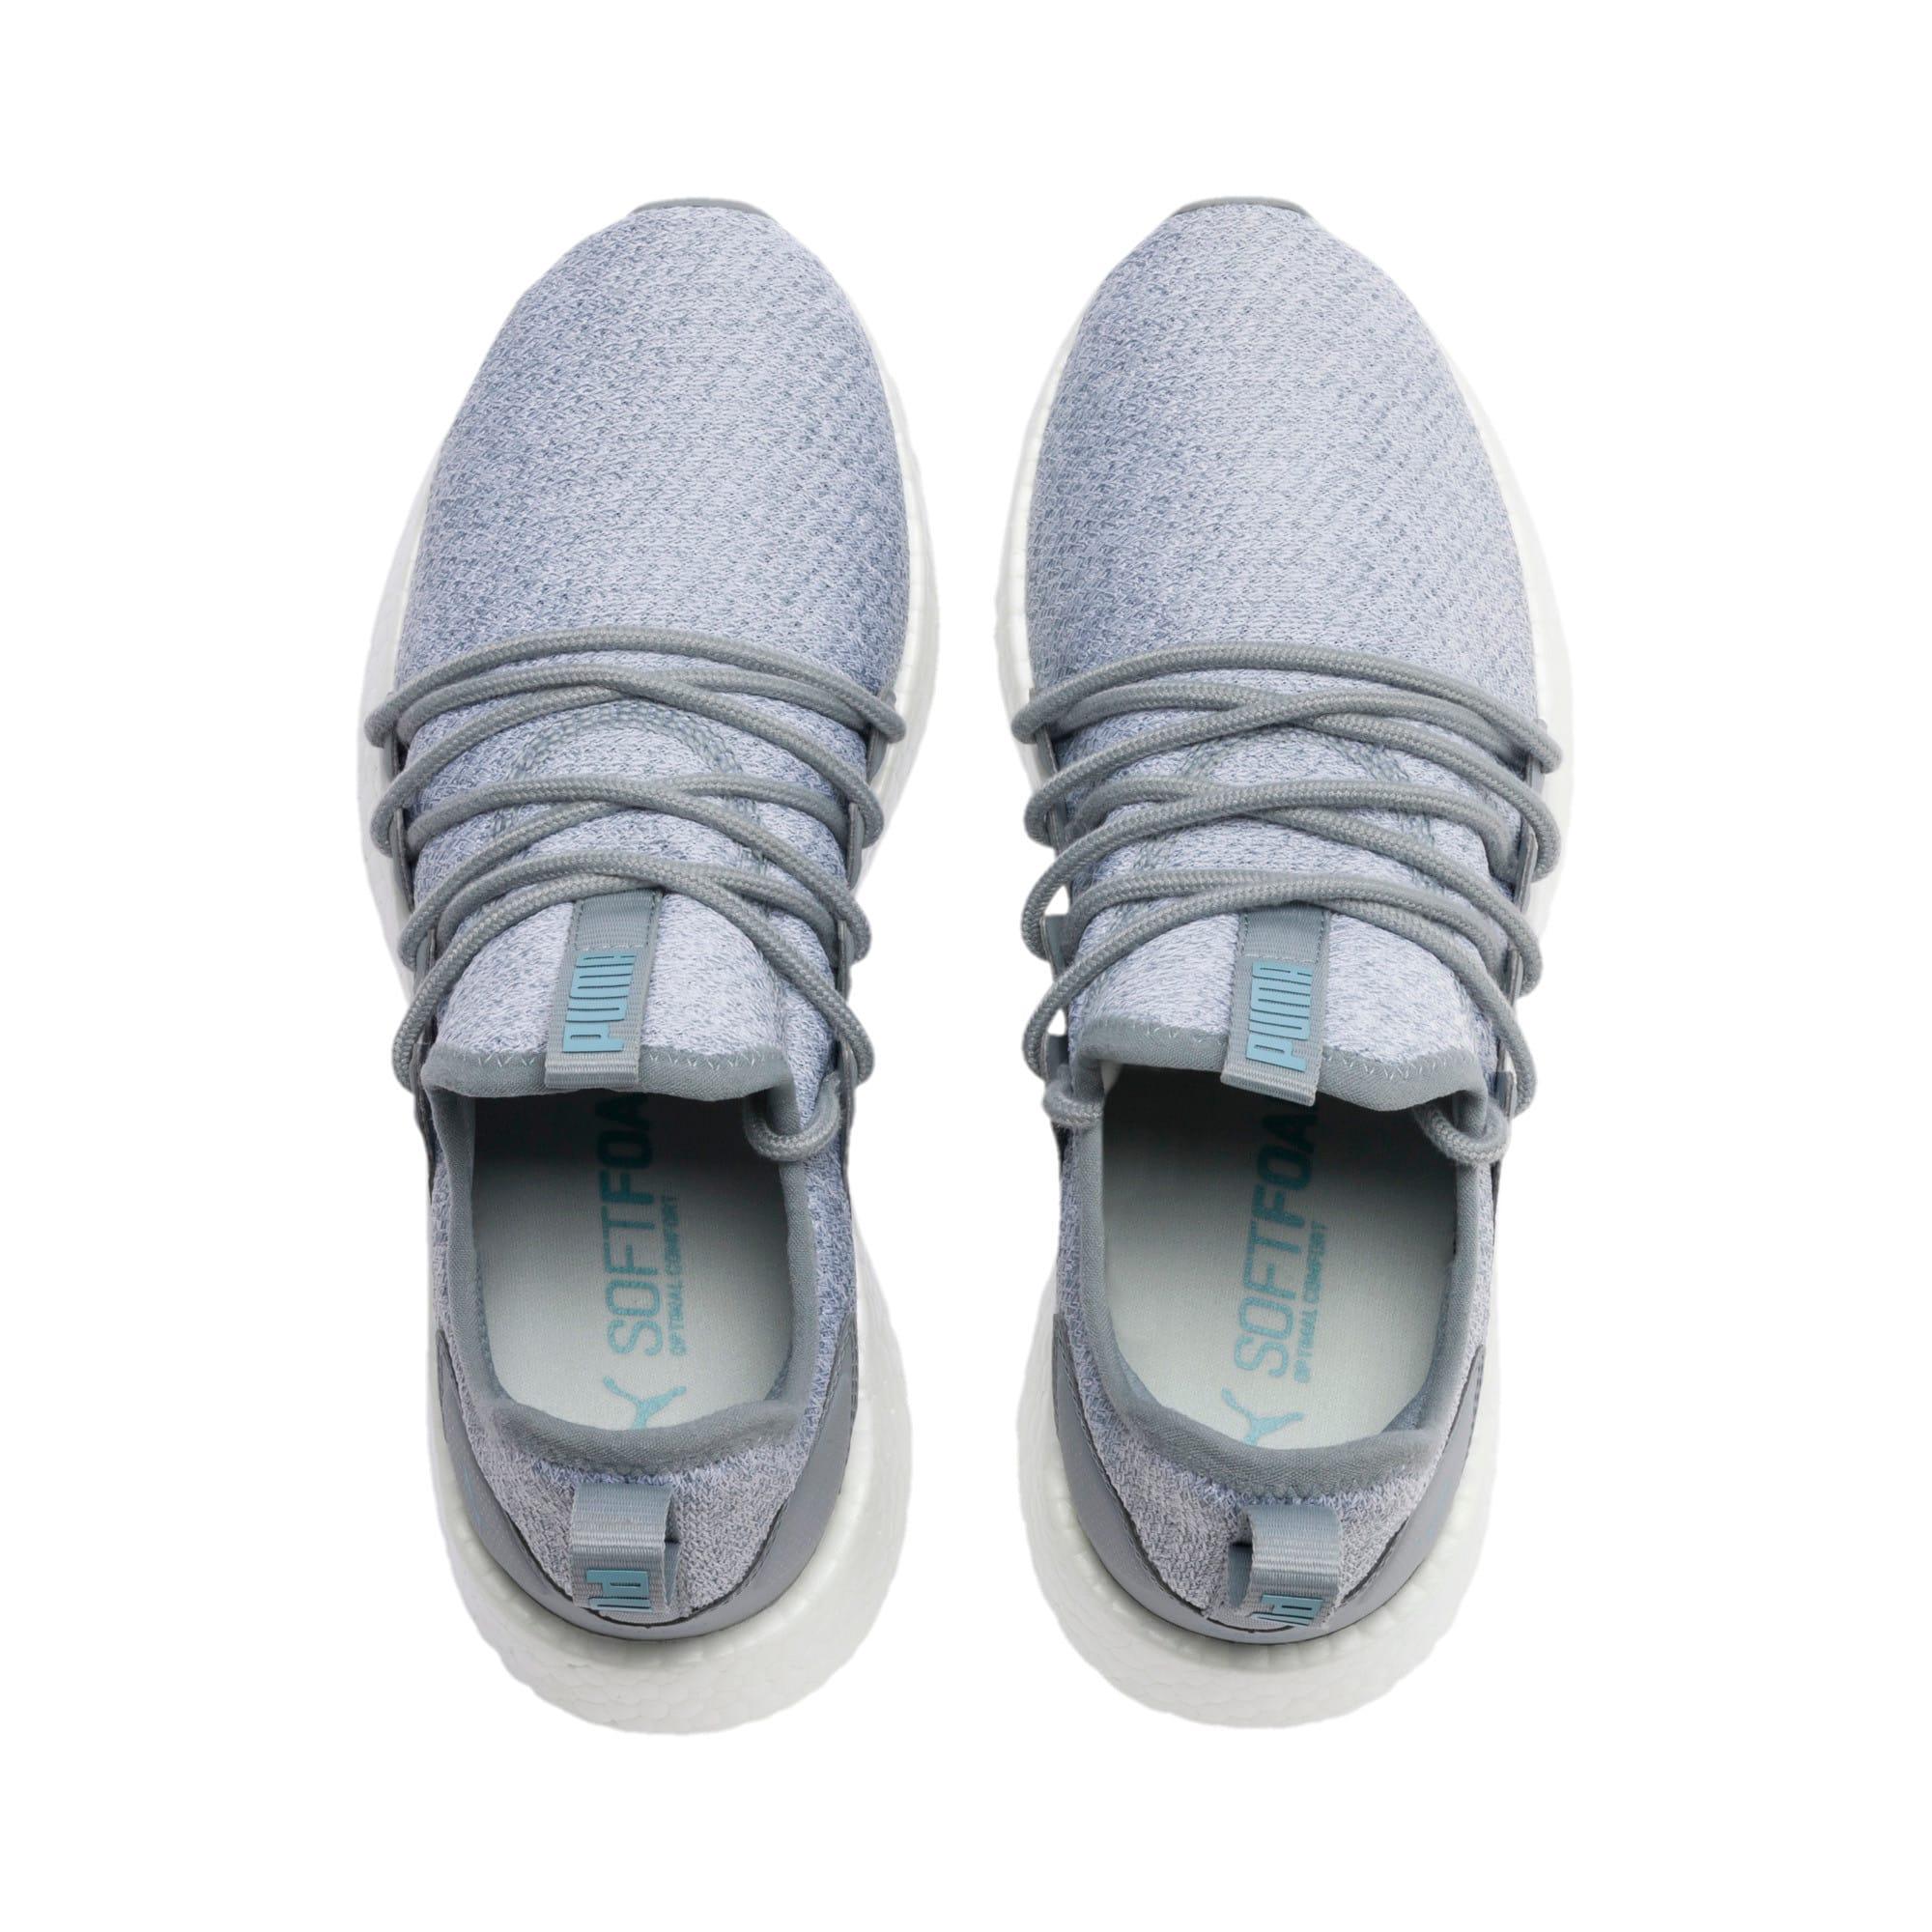 Thumbnail 4 of NRGY Neko Knit Women's Running Shoes, Quarry, medium-IND